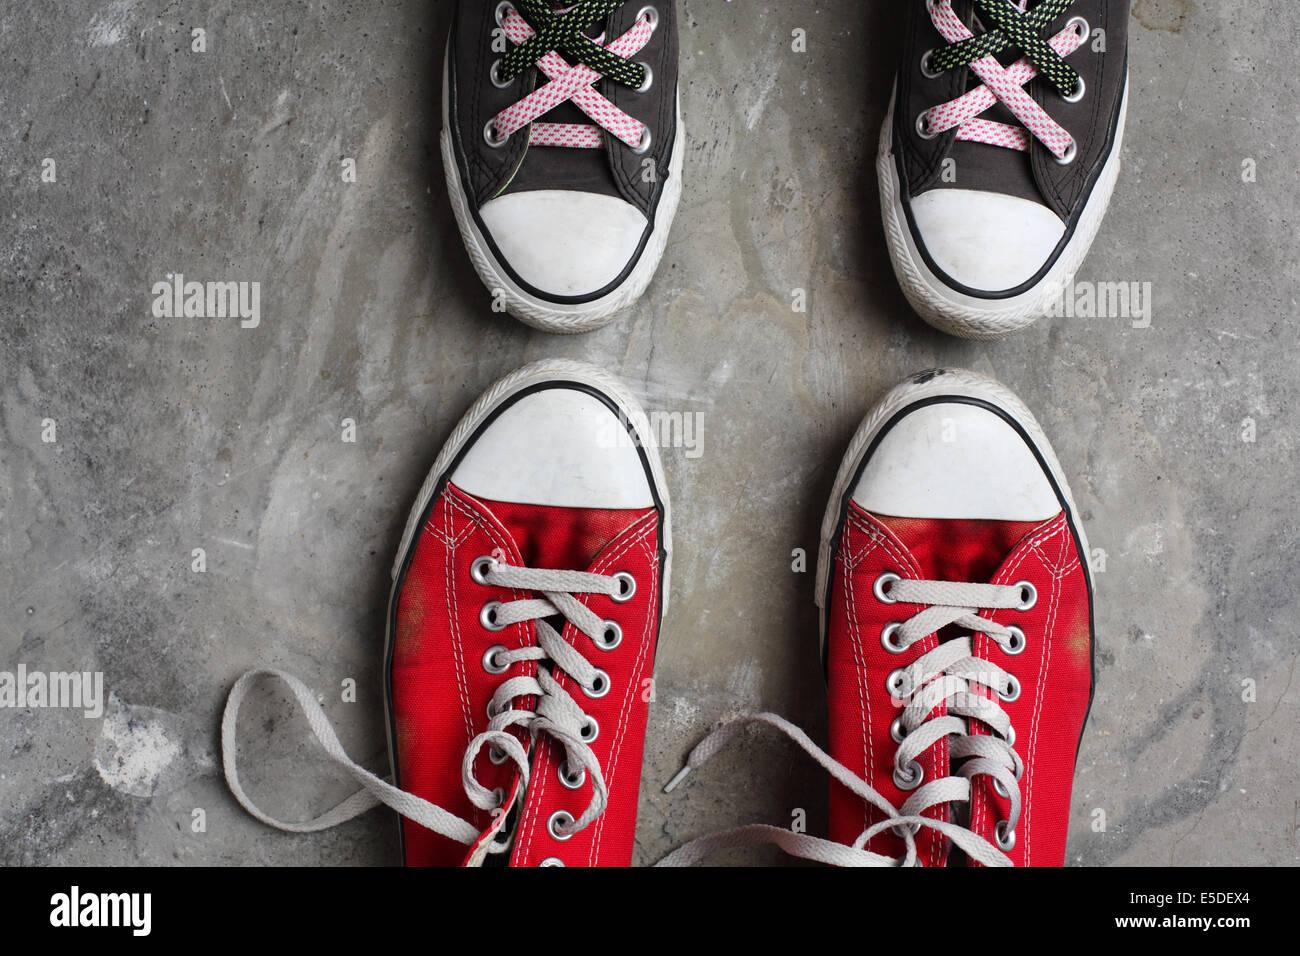 Converse Scarpe Immagini   Converse Scarpe Fotos Stock - Alamy 873e3d4078b